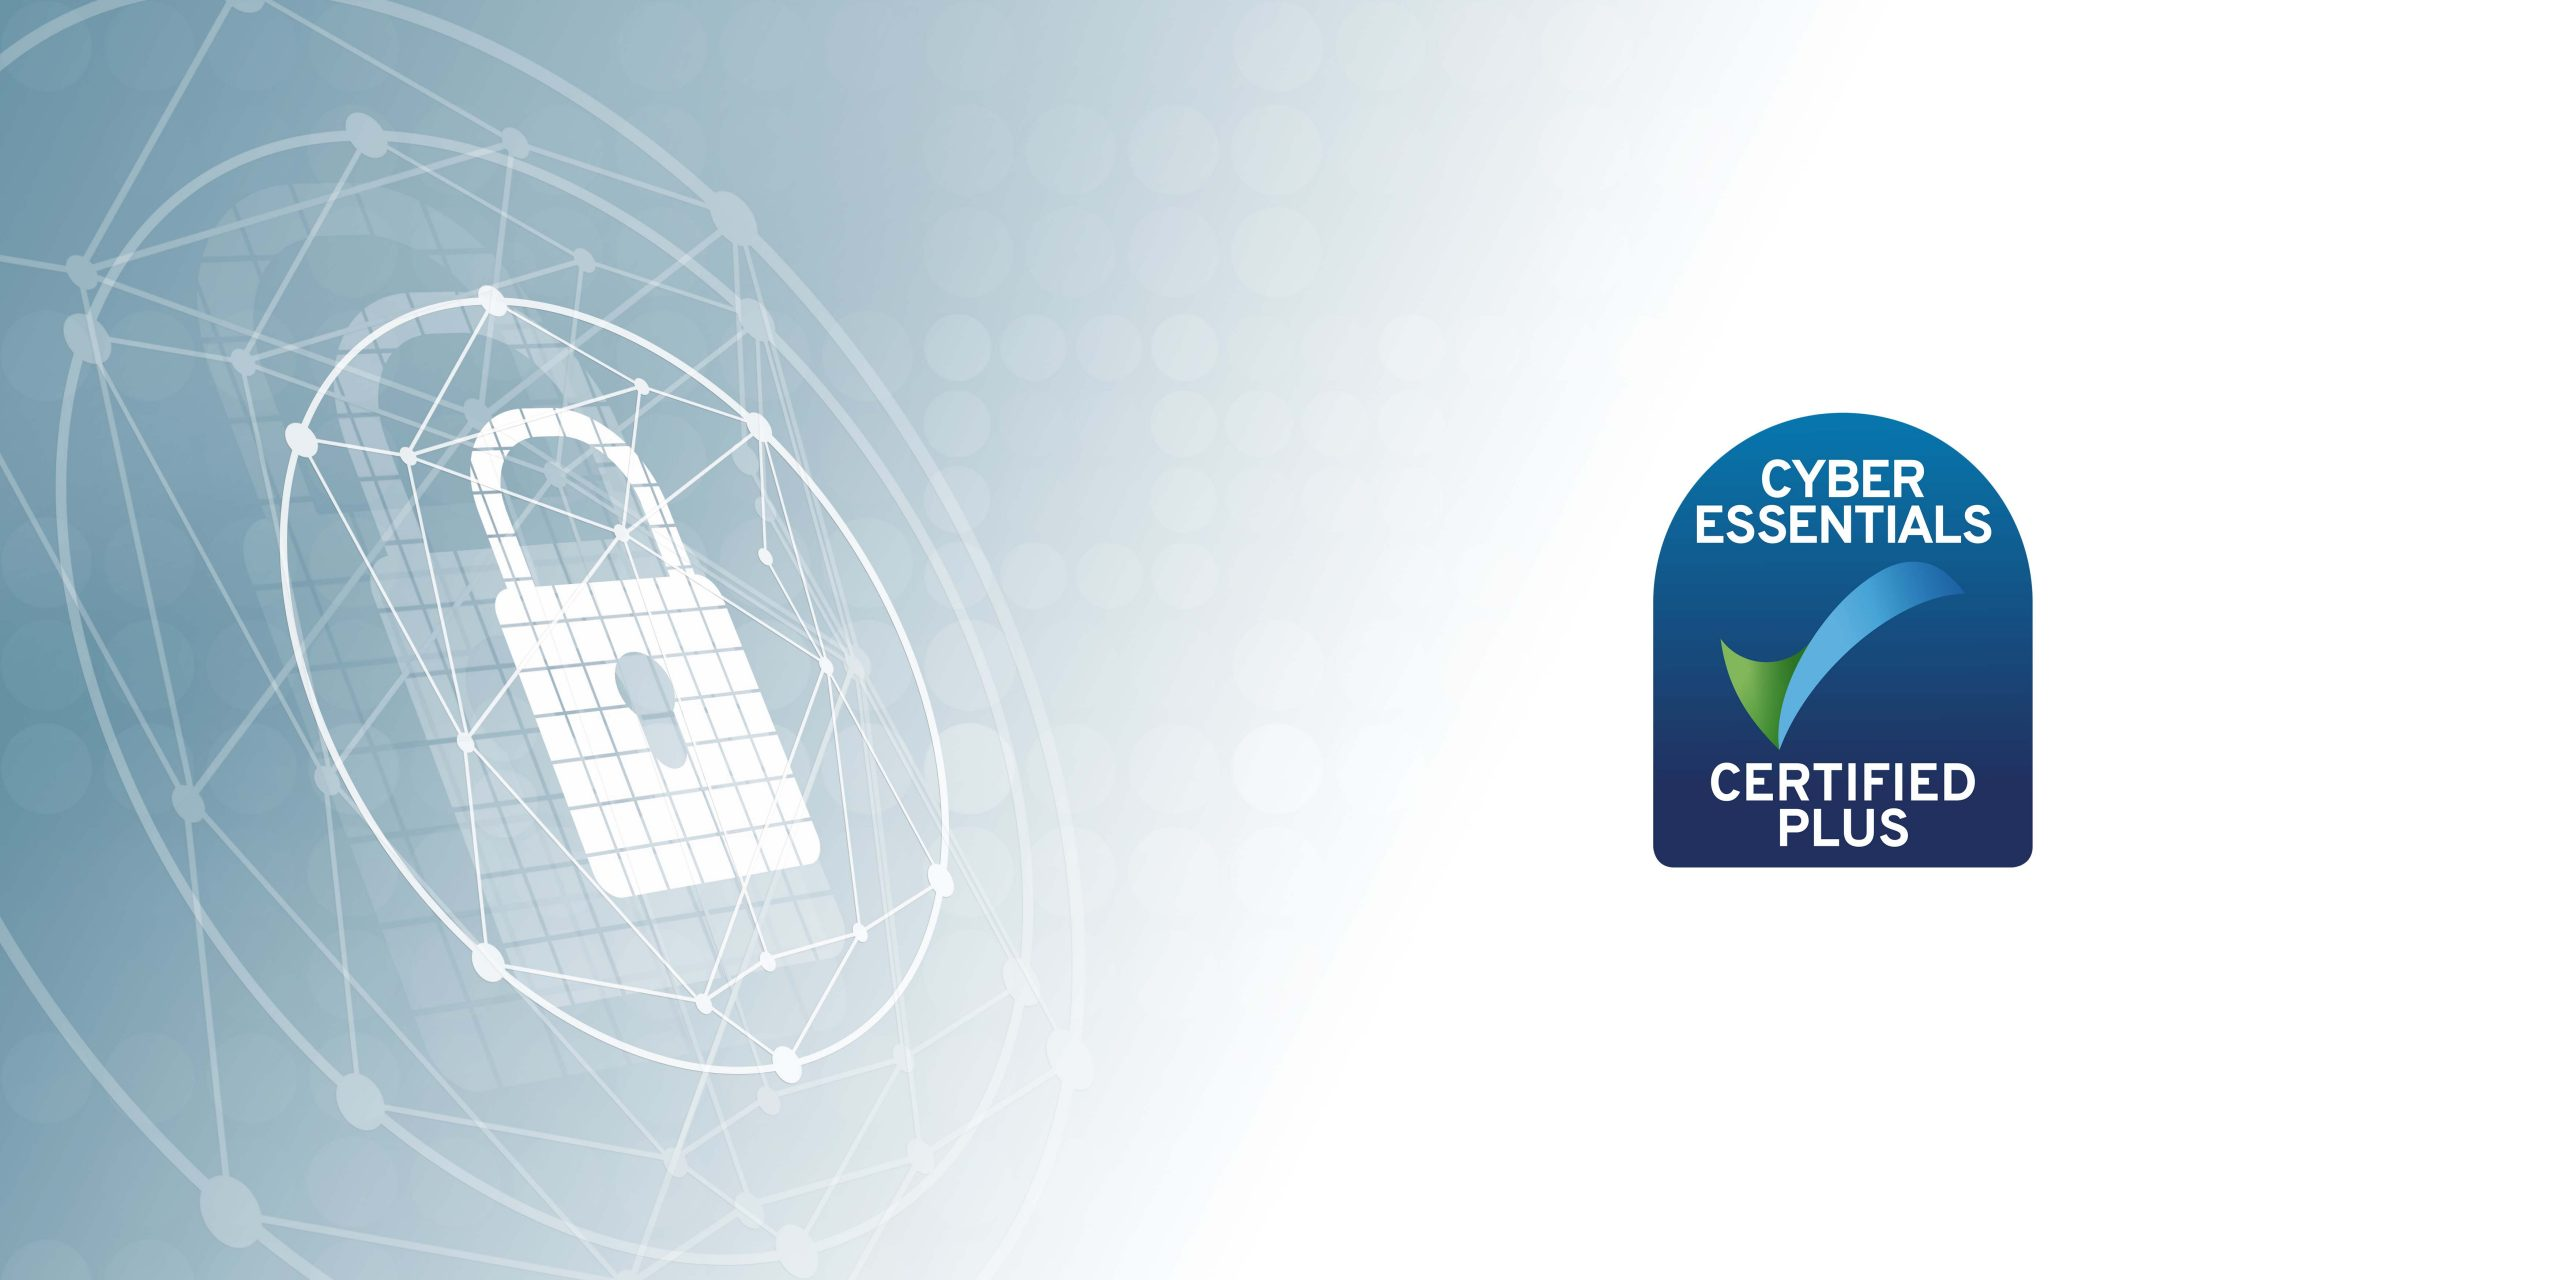 CVE Achieve Cyber Essentials Plus Certification